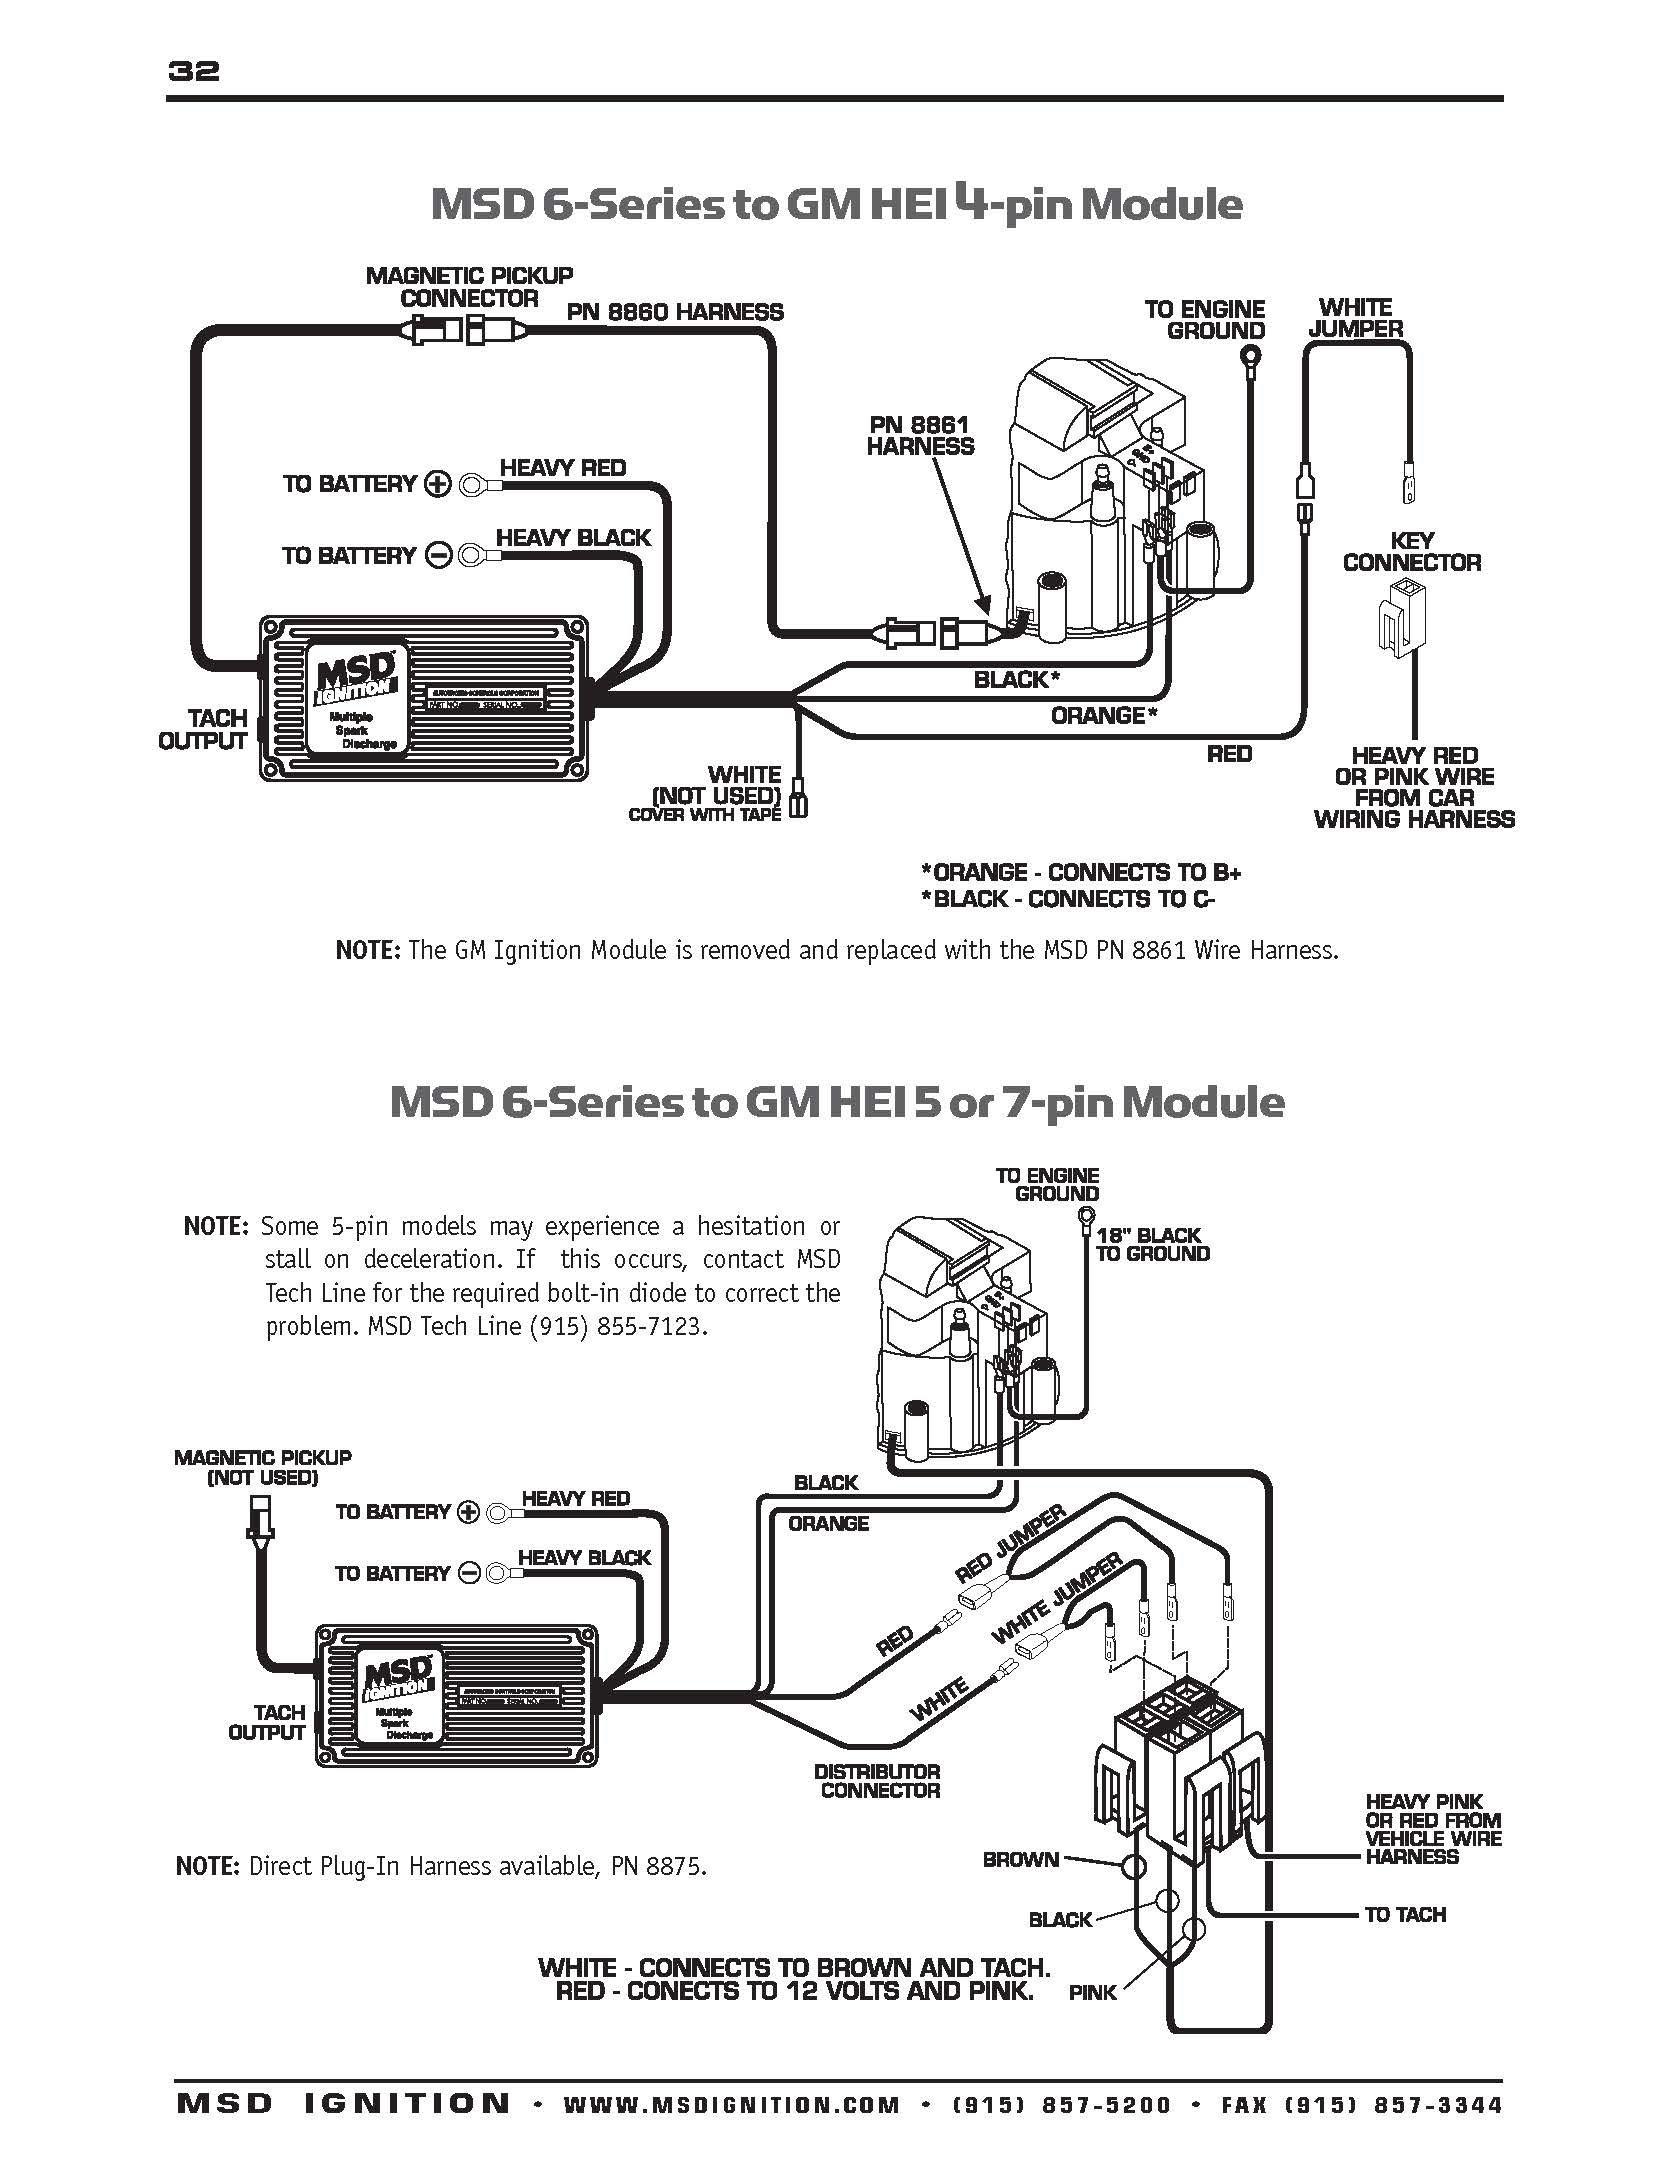 jacobs electronics energy pak wiring diagram carbonvote mudit blog \u2022 CDI Ignition Wiring Diagram jacobs electronics wiring diagram 8 partnerkompass de u2022 rh 8 partnerkompass de